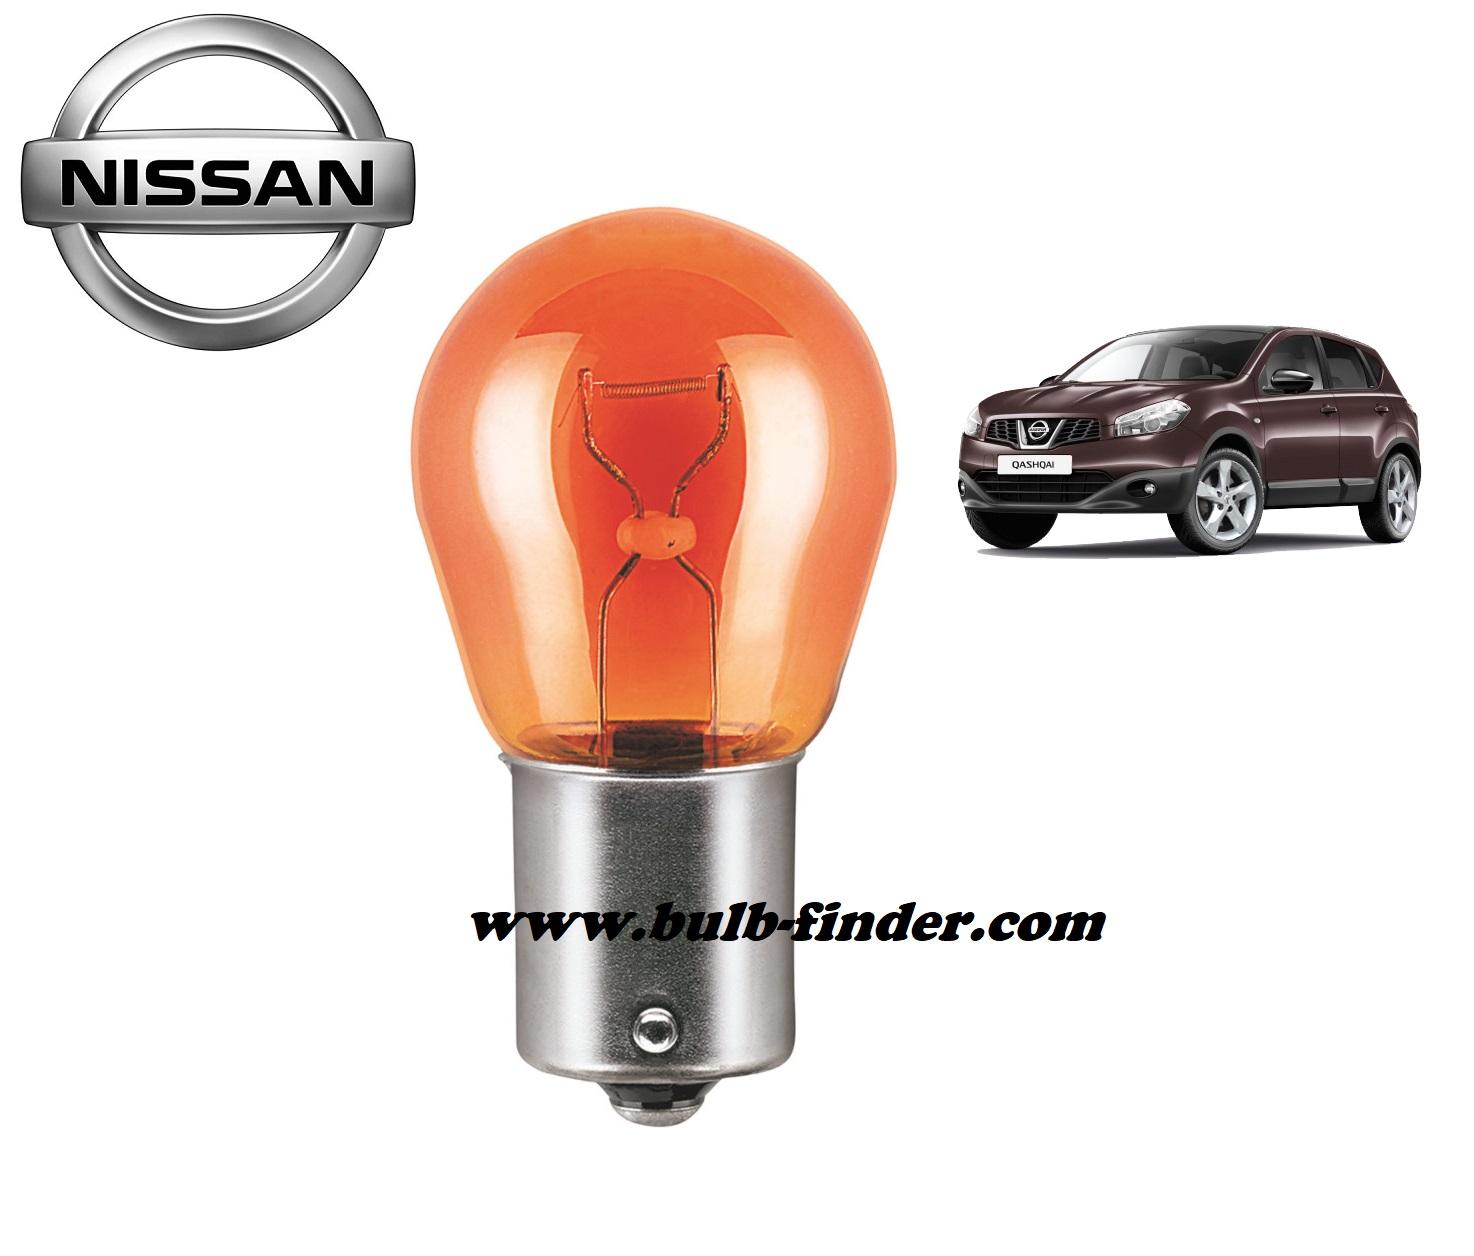 Nissan Qashqai bulb model FRONT DIRECTION INDICATOR